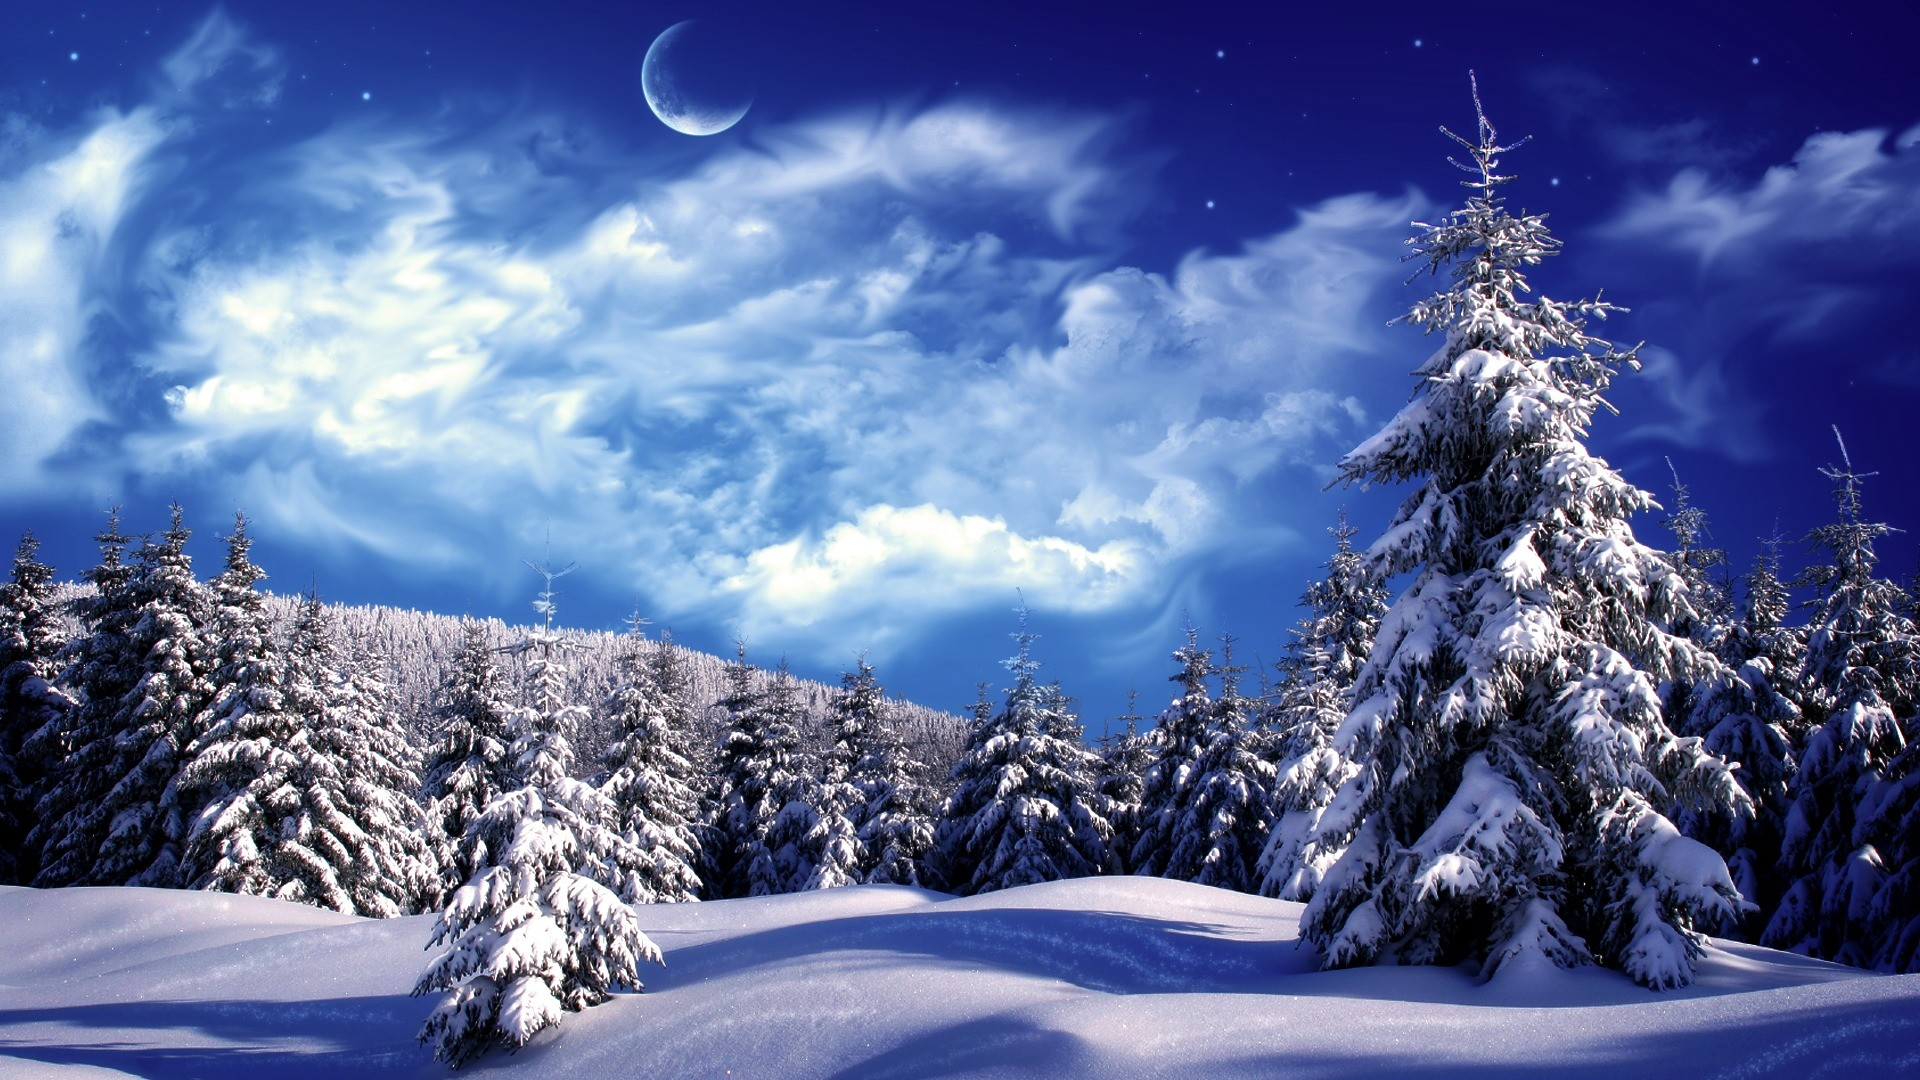 Winter Wallpaper Wide